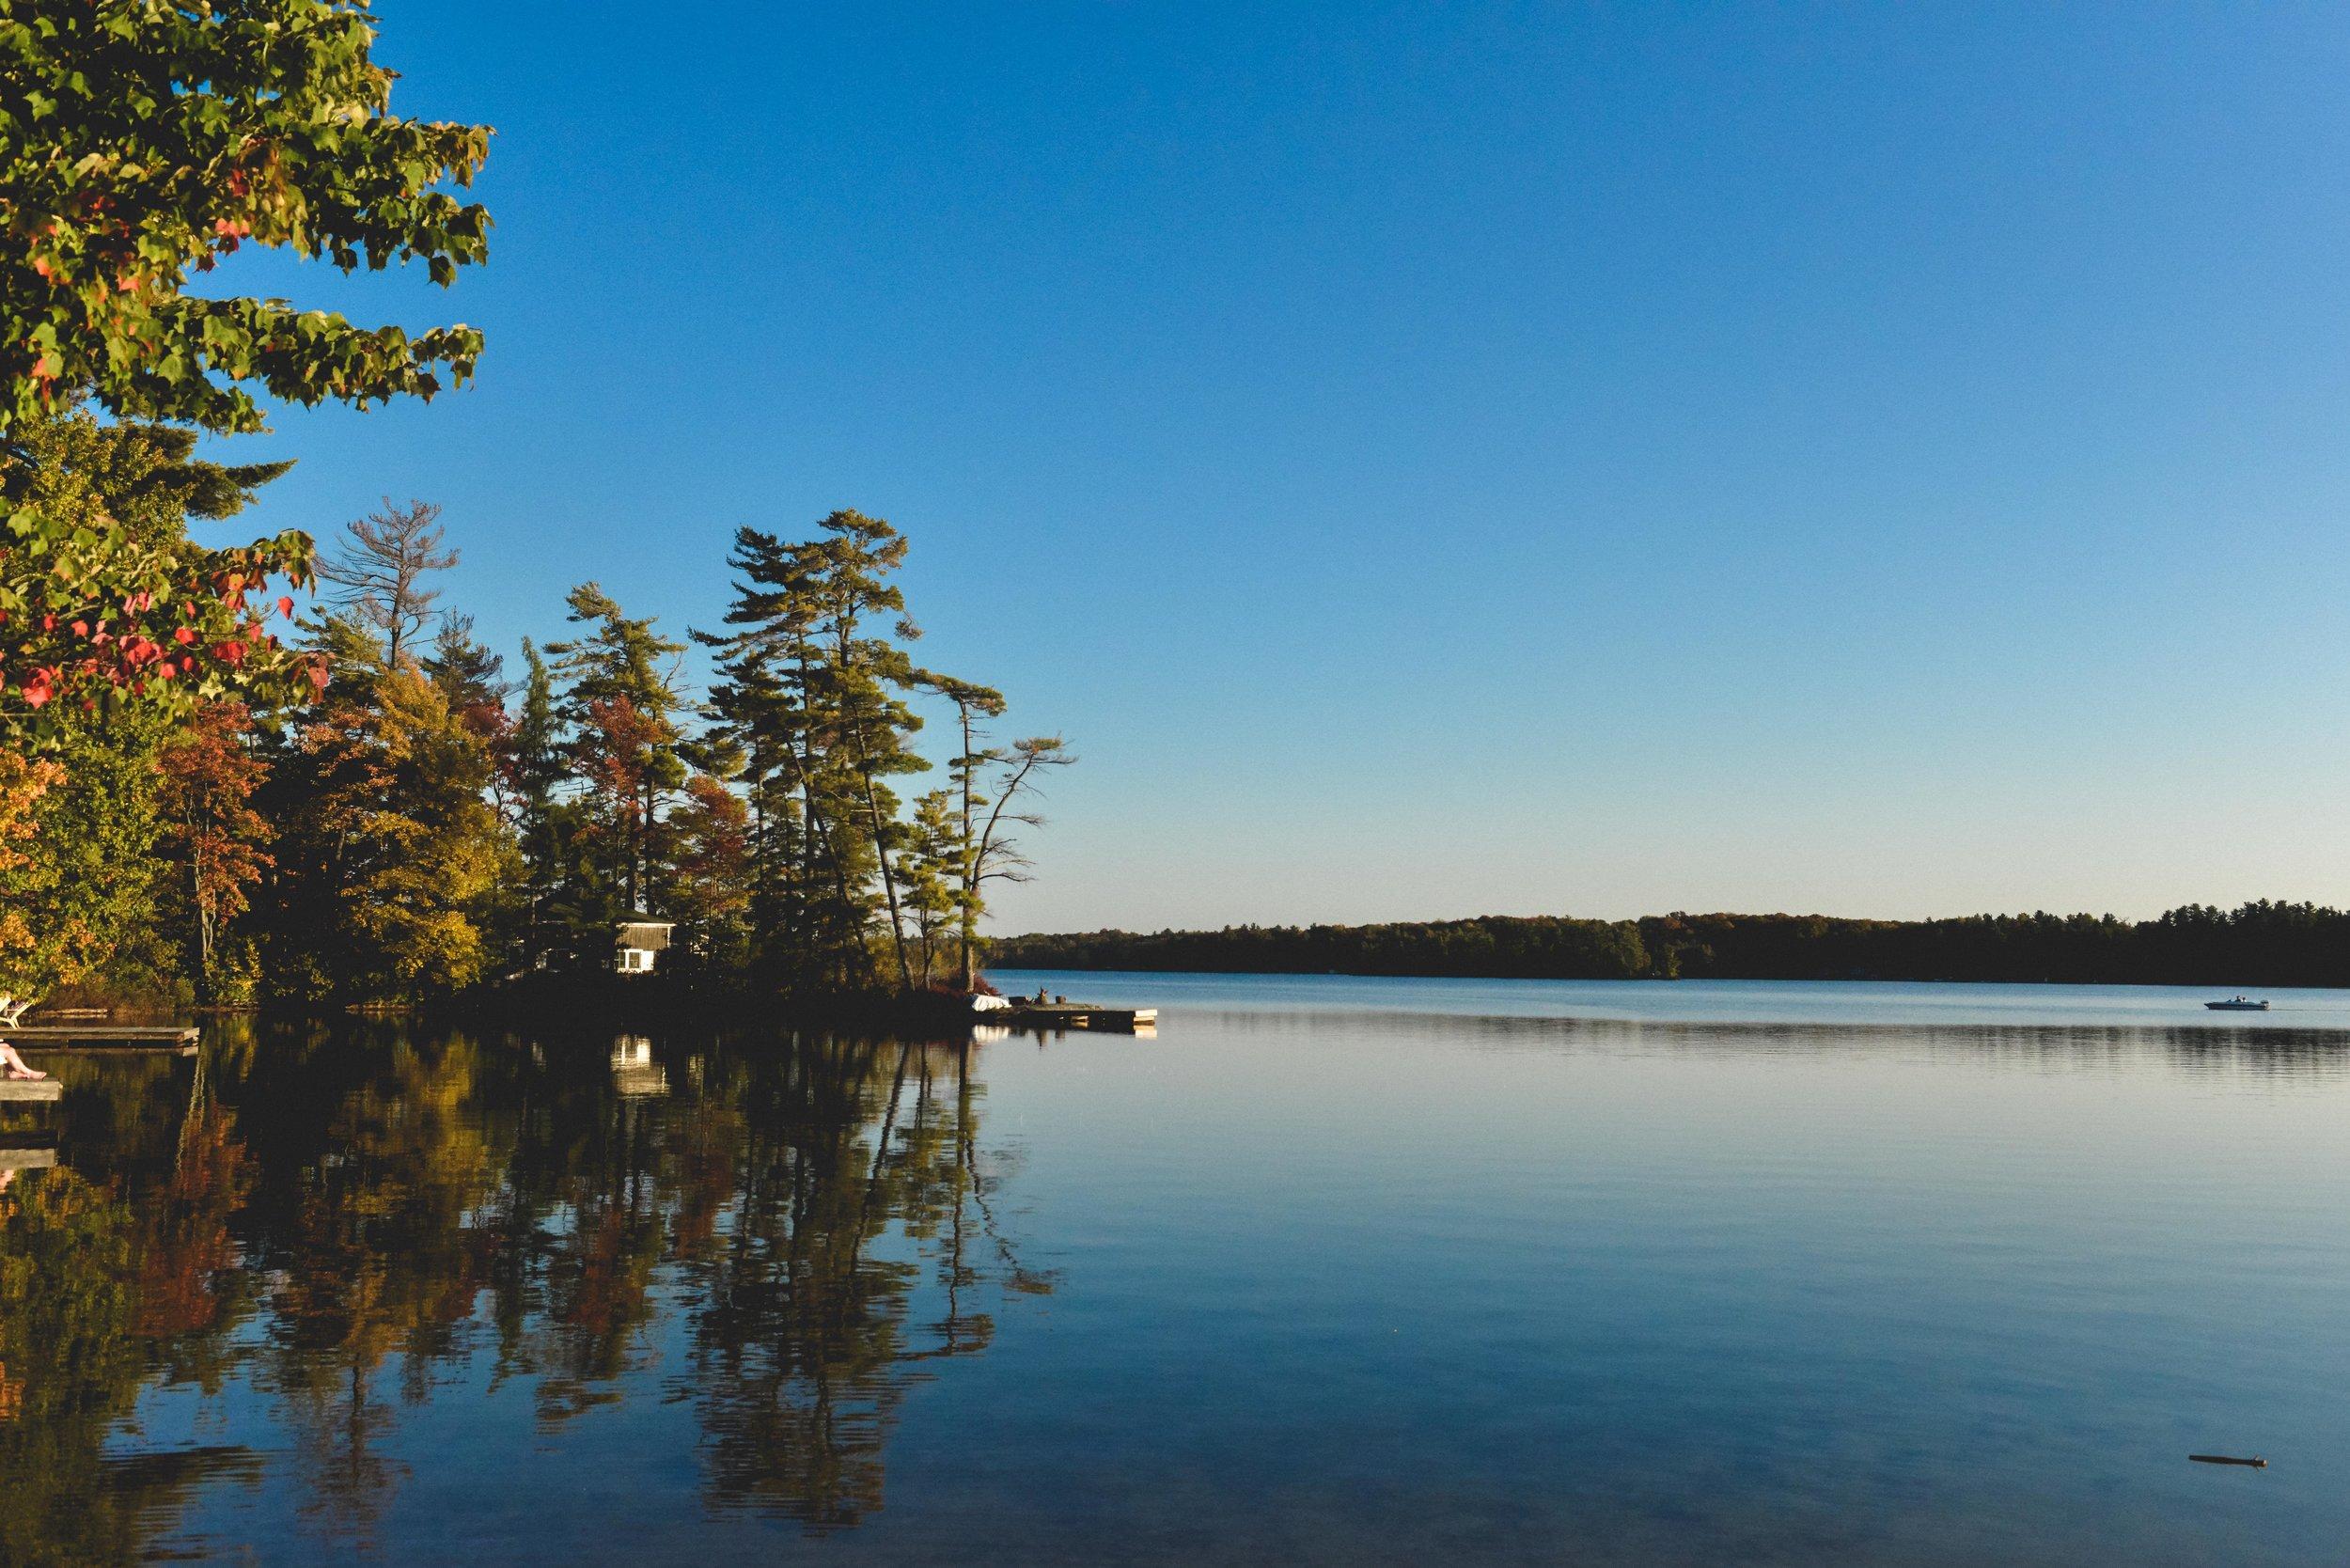 ryan thompson creative photography - the lake